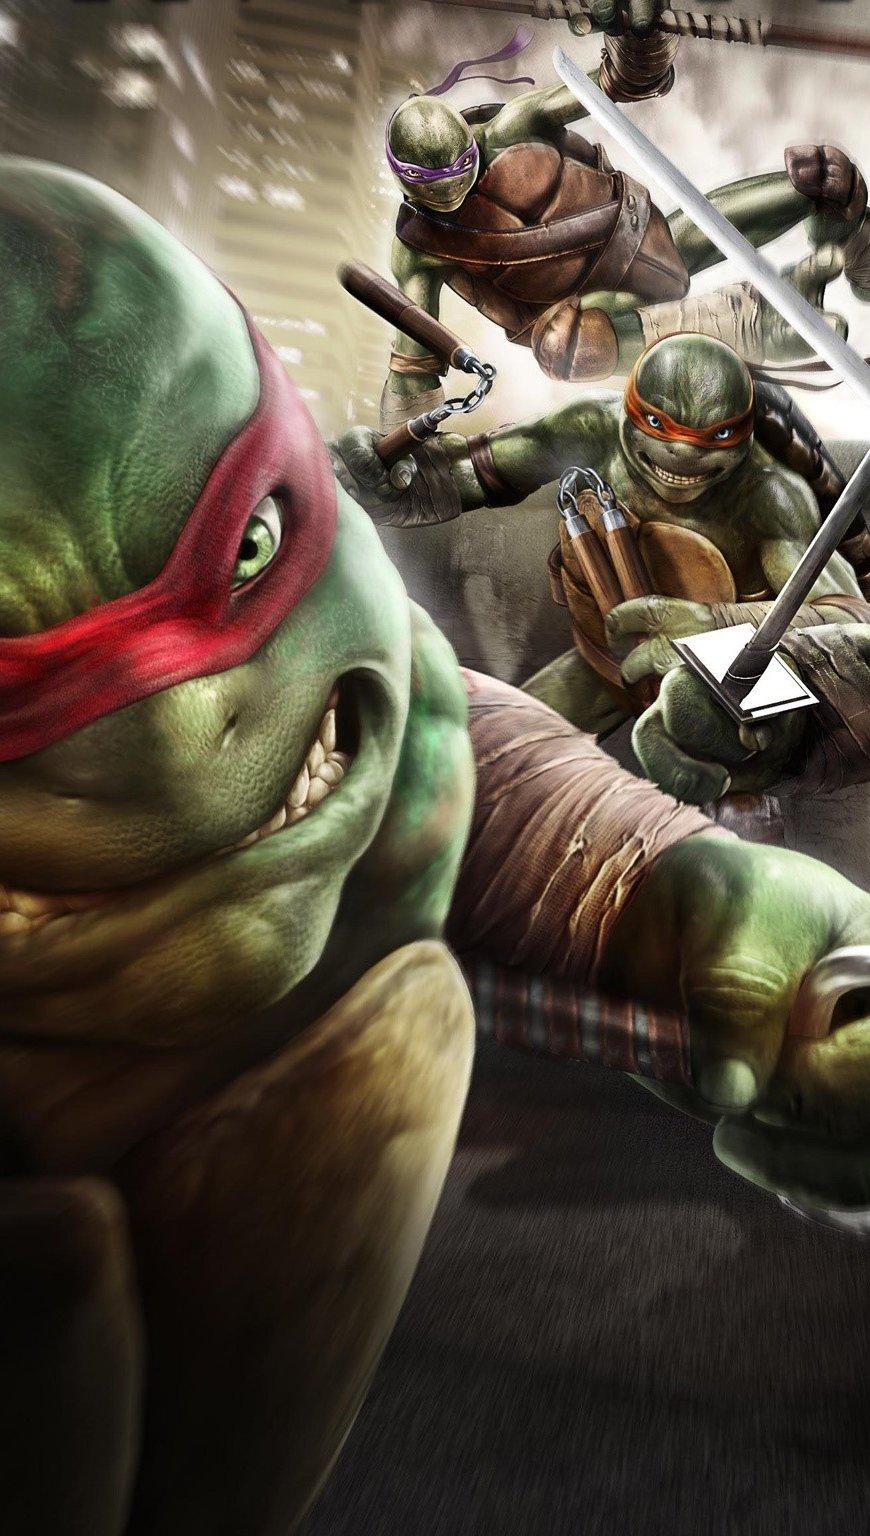 Wallpaper Ninja Turtles Vertical